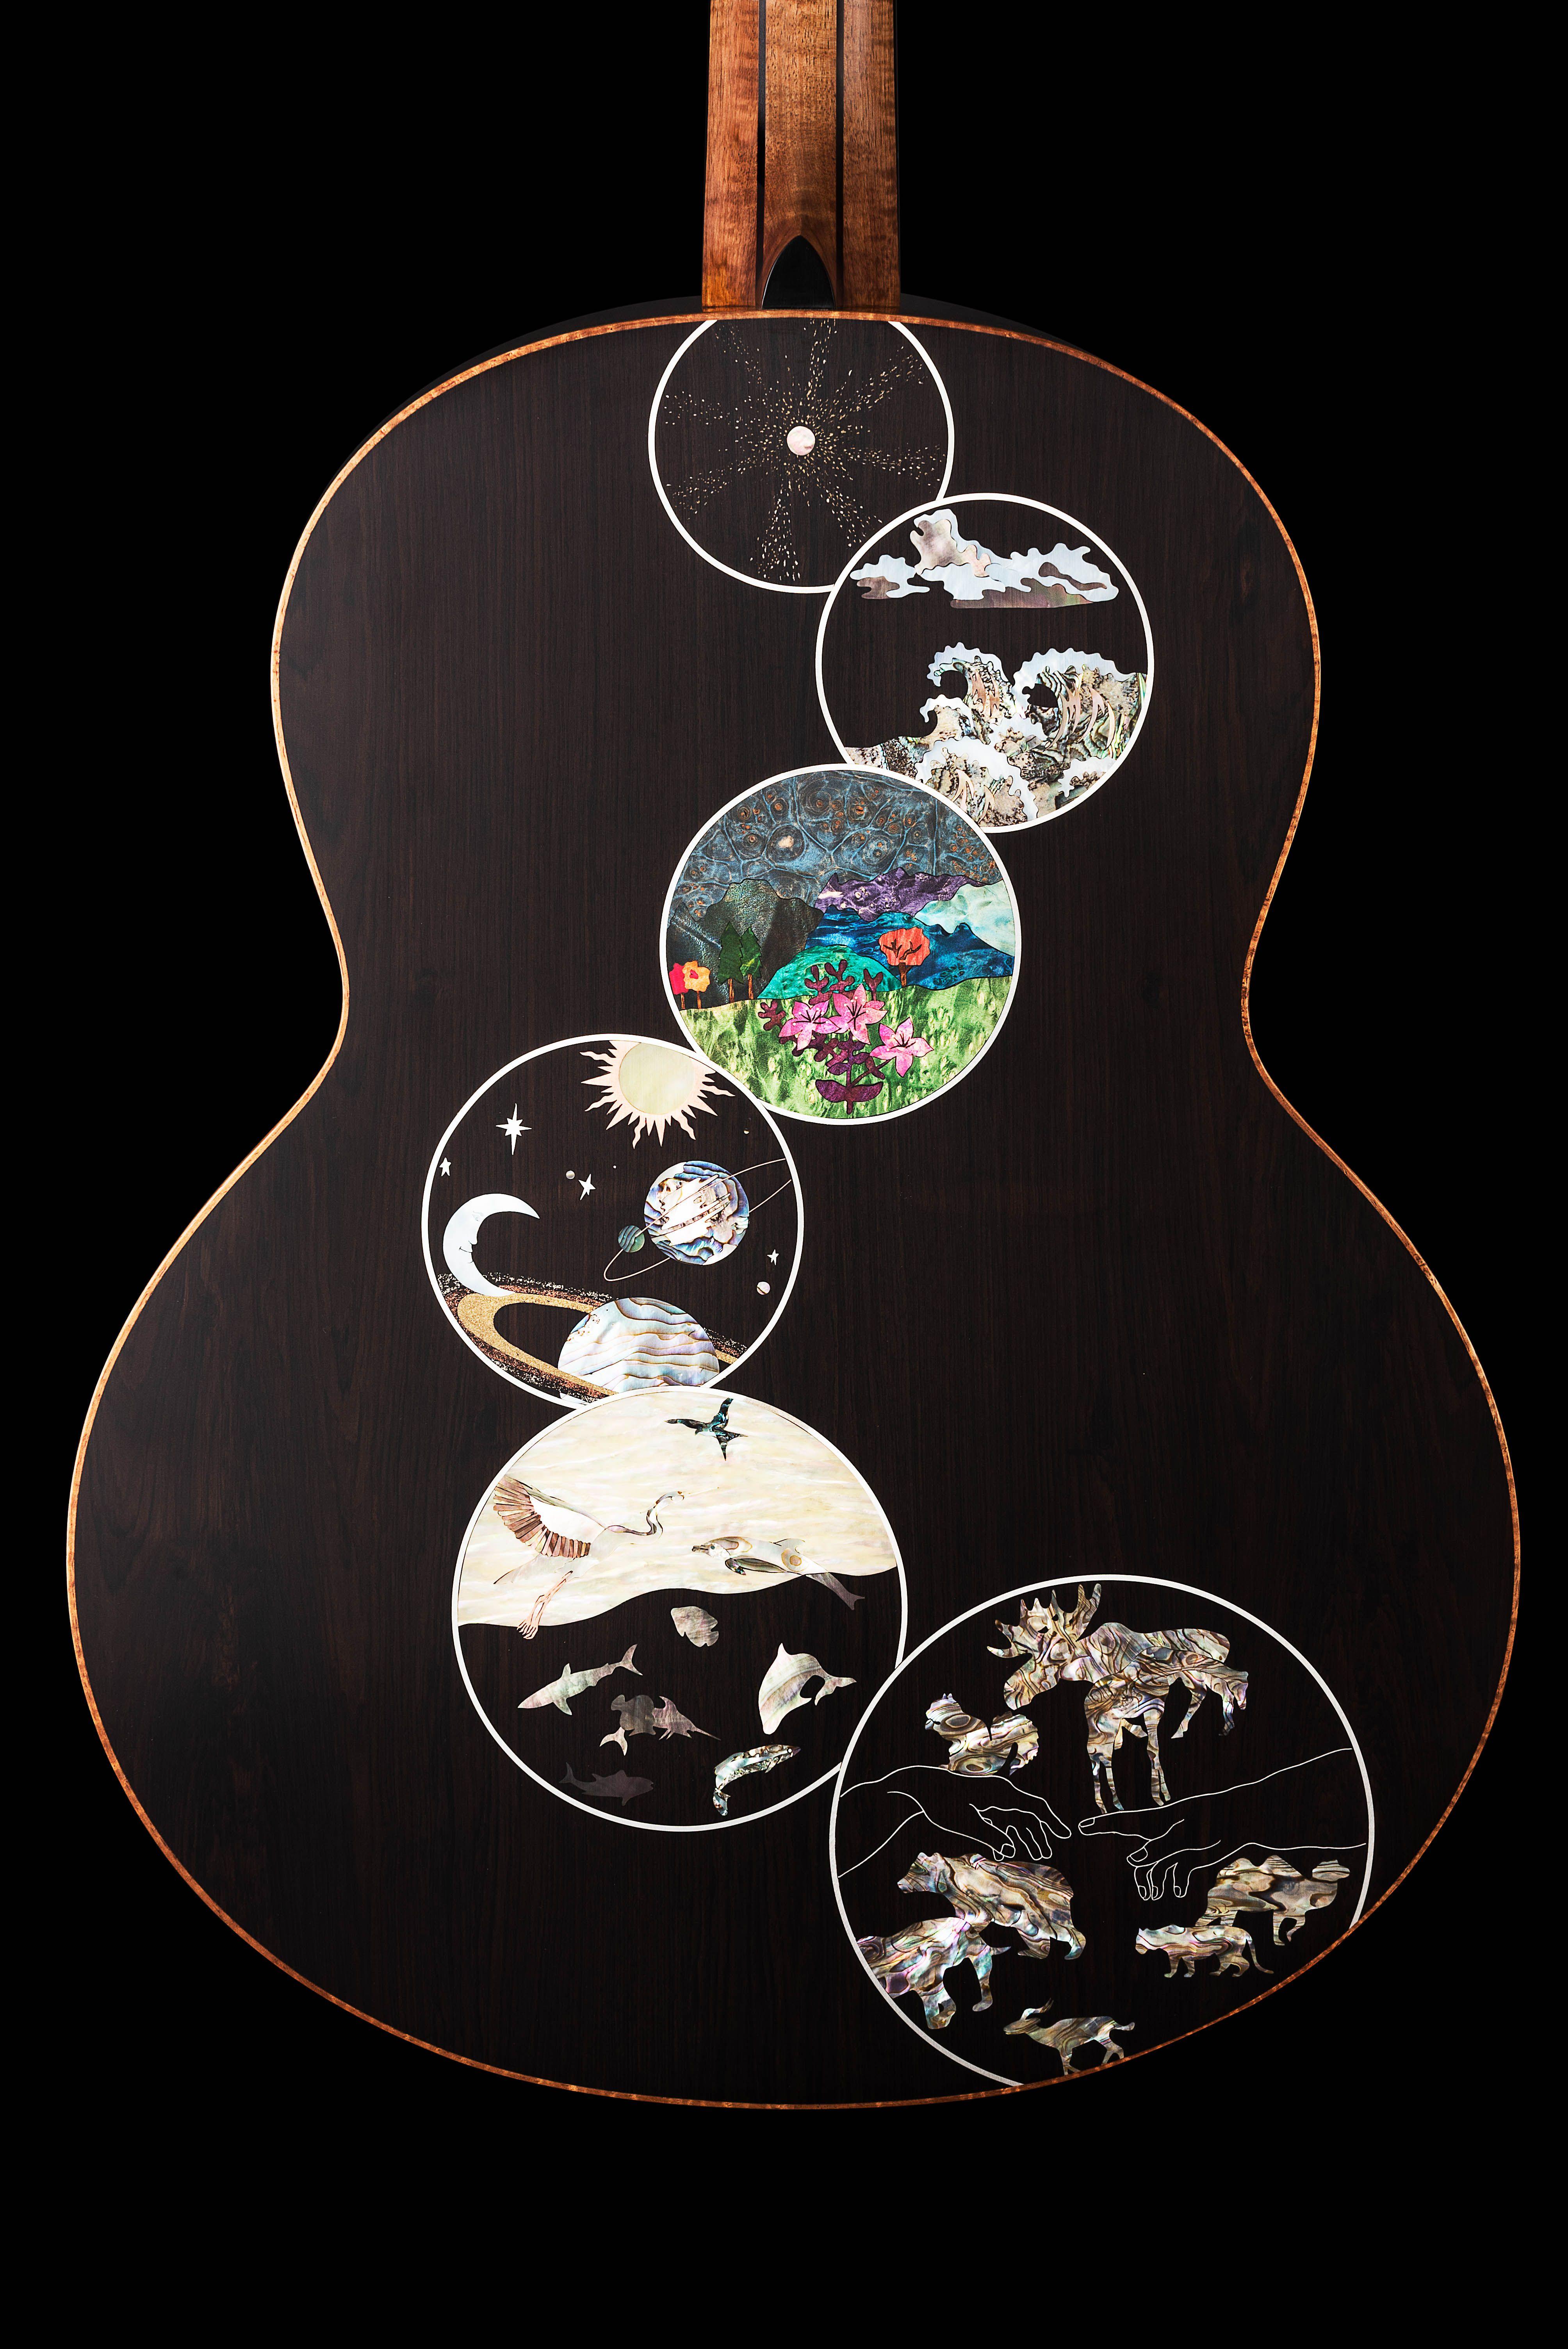 Genesis 20000 Lowden Guitars Handmade And Hand Built Acoustic Guitar Range From Downpatrick Ireland Guitar Inlay Genesis Inlay